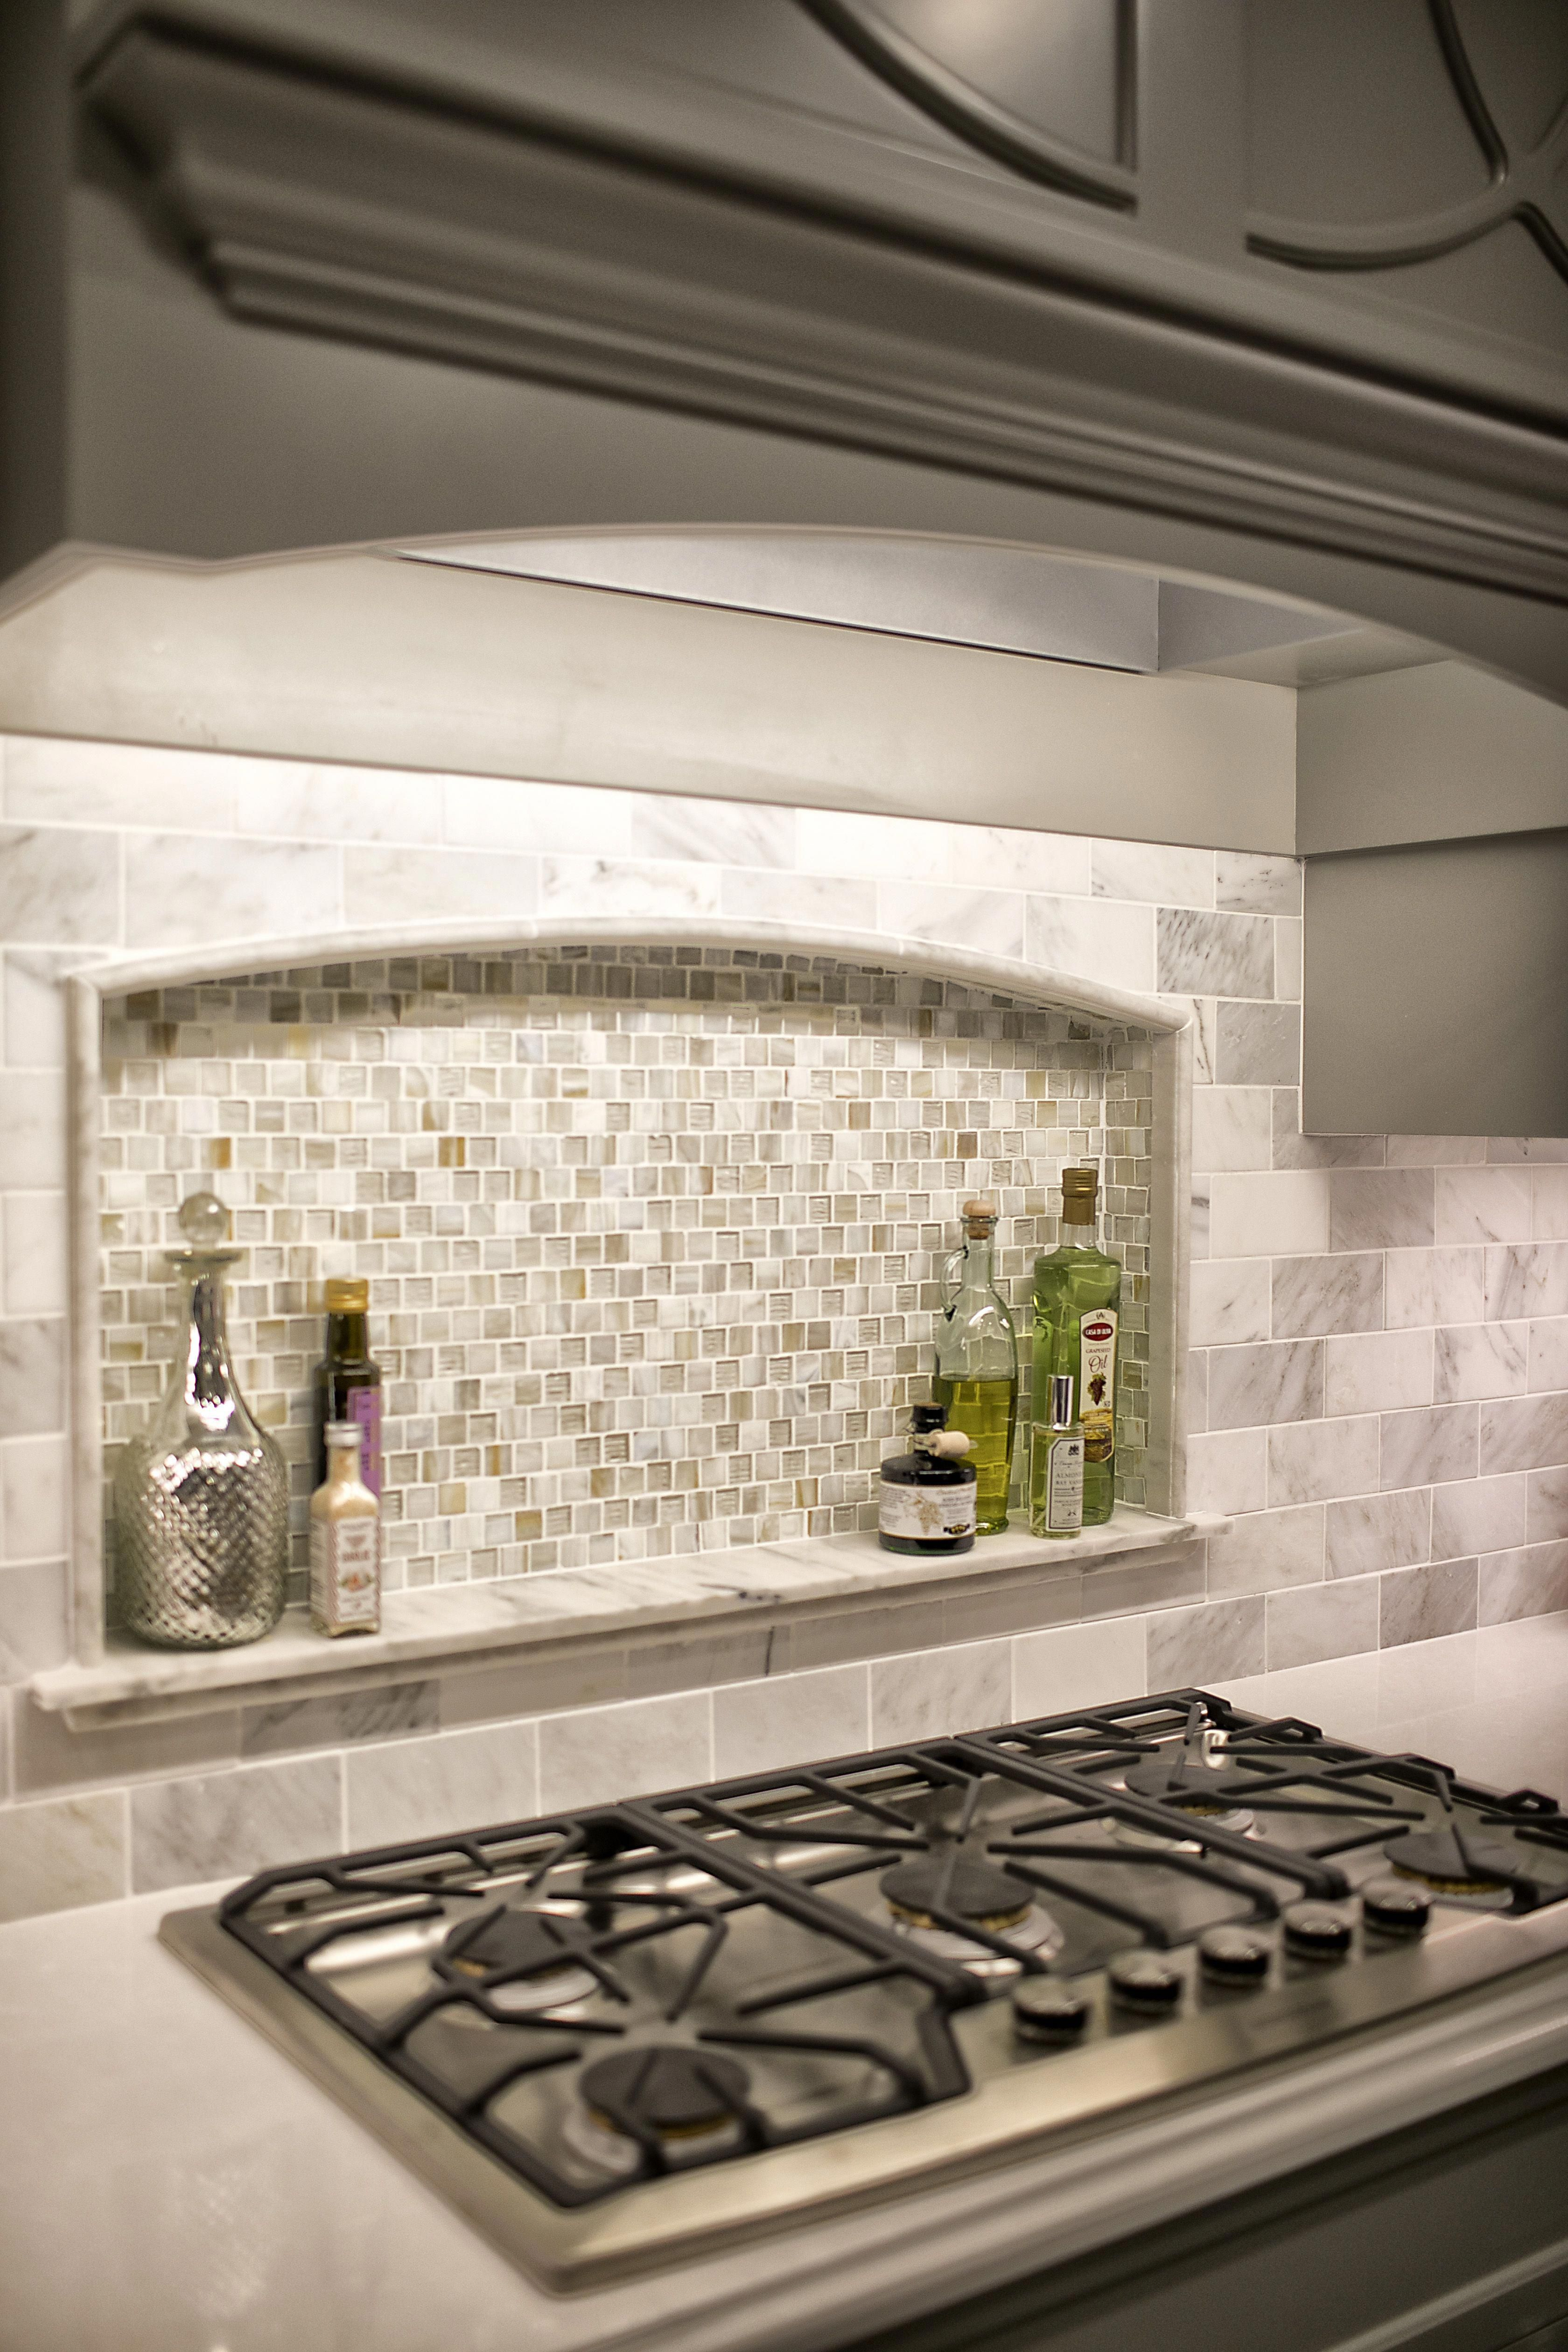 - Custom Niche In Kitchen Backsplash With Marble Ledge. Marble And